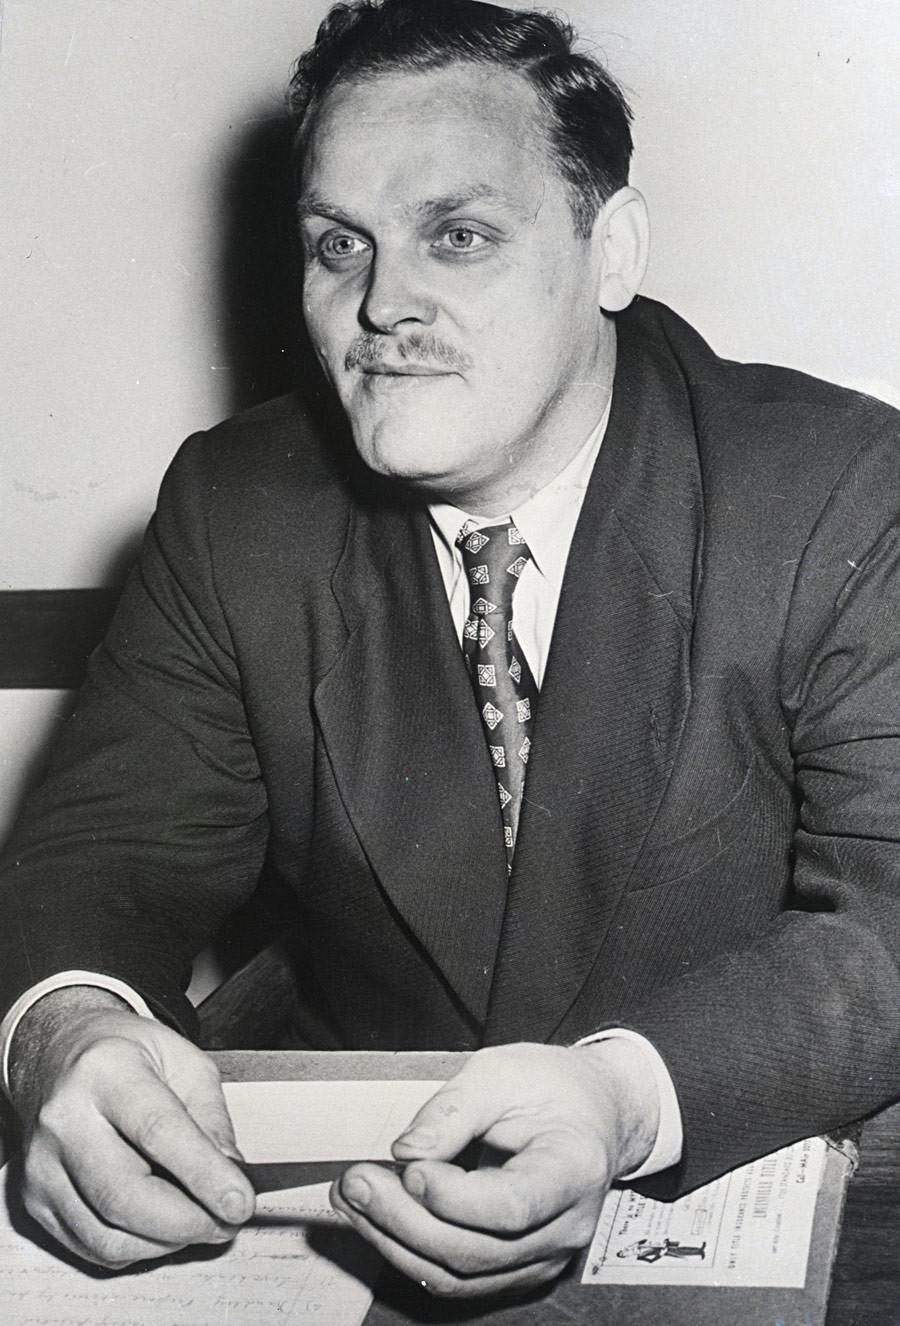 Gus Hall, segretario generale Cpusa dal 1959 al 2000